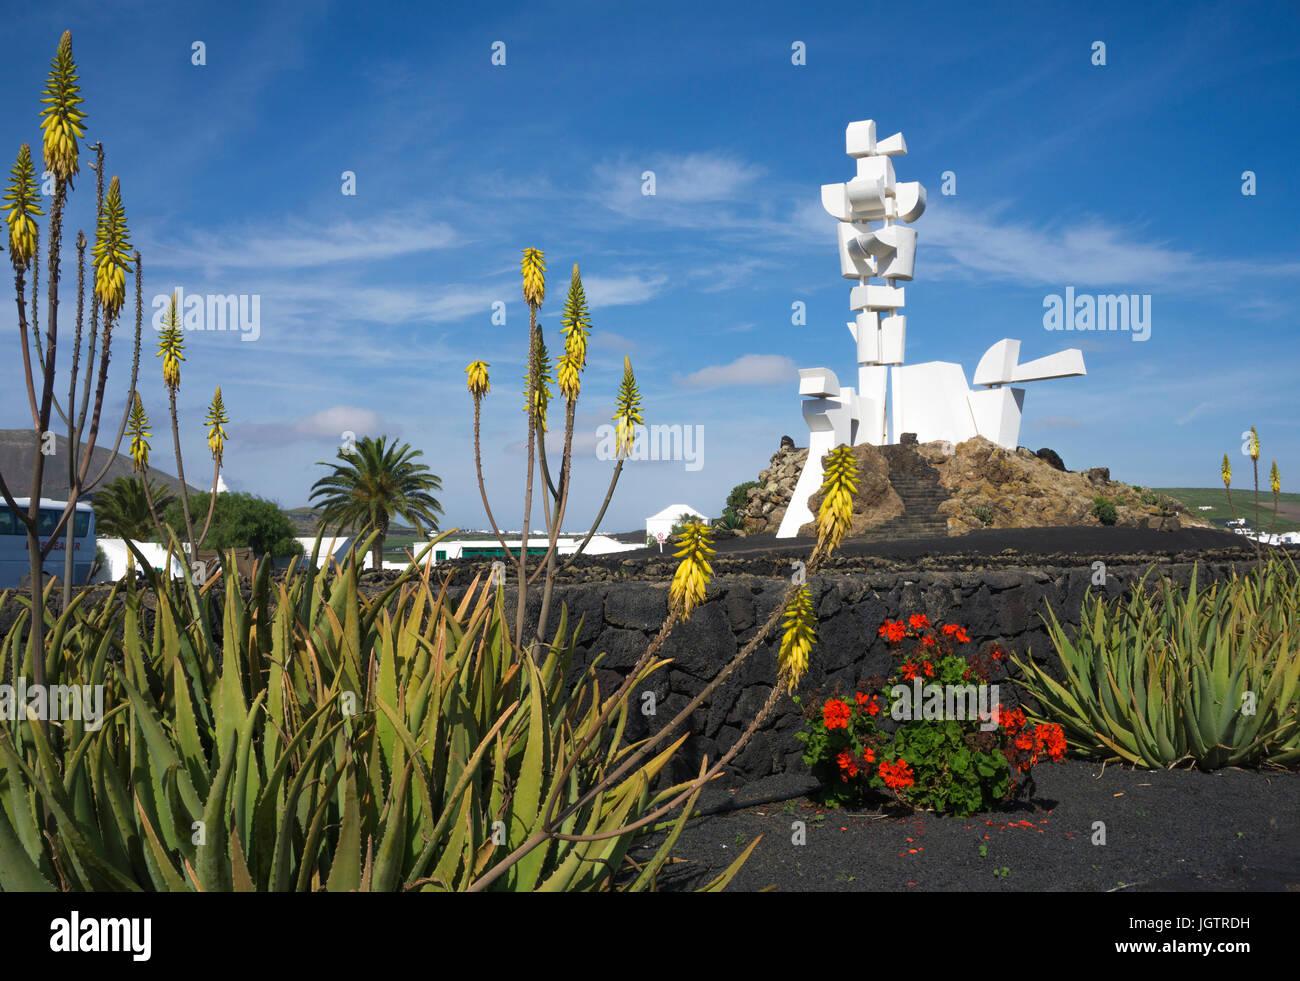 Echte Aloe (Aloe Vera, Aloe Barbadensis) am monumento al Campesino, Monumento a la fecundidad von César Manrique, Stockbild